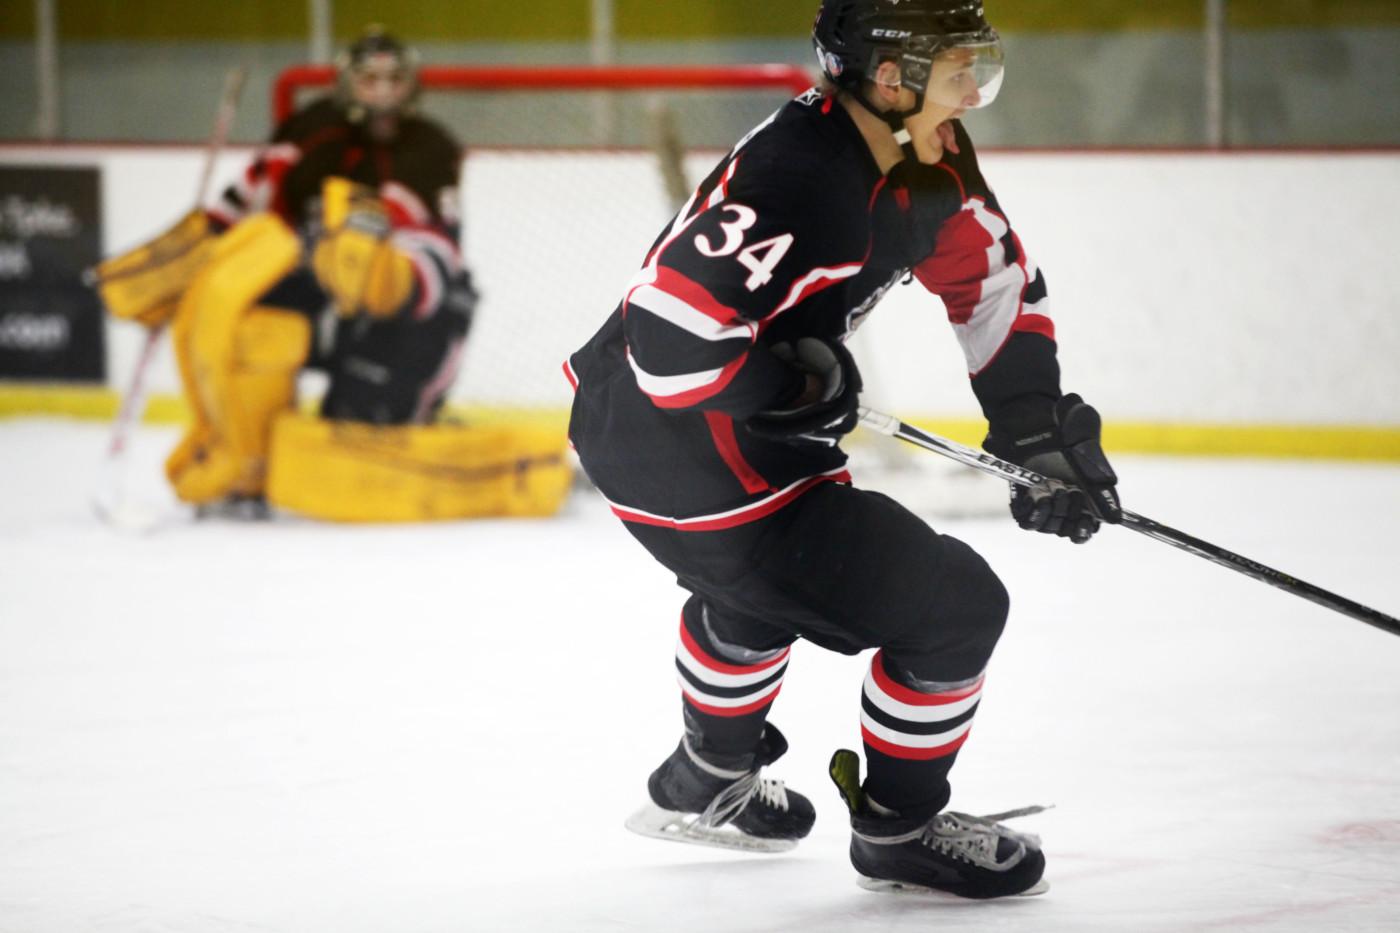 USHL: Maine Recruit Tralmaks Finds Groove In Playoffs